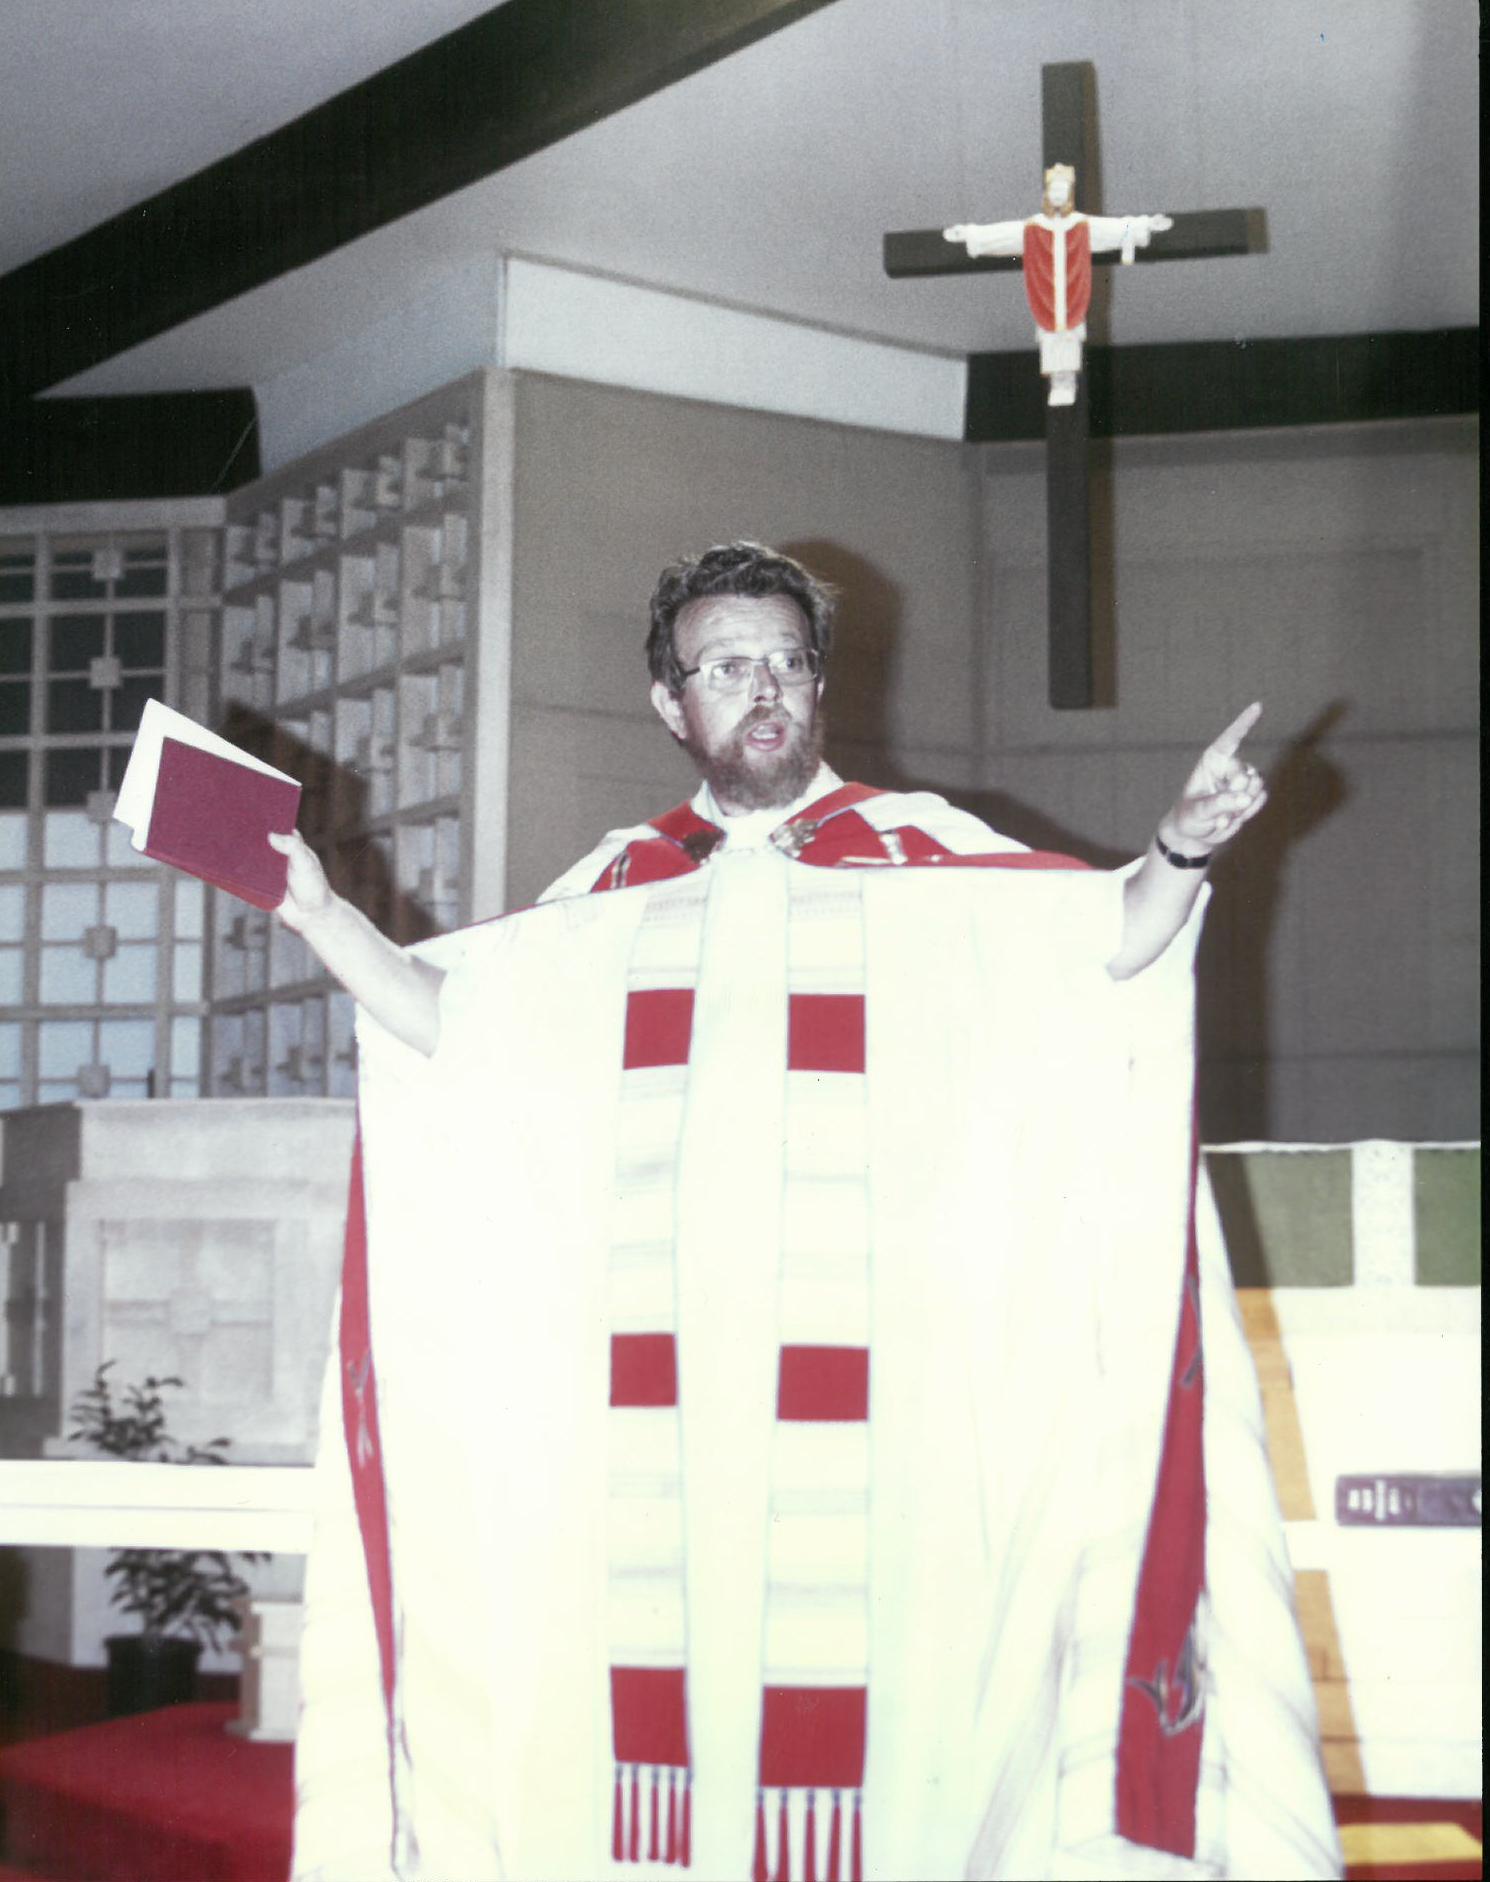 Bob Hibbs - 1st Rector of St. Stephen's - 1975-1977